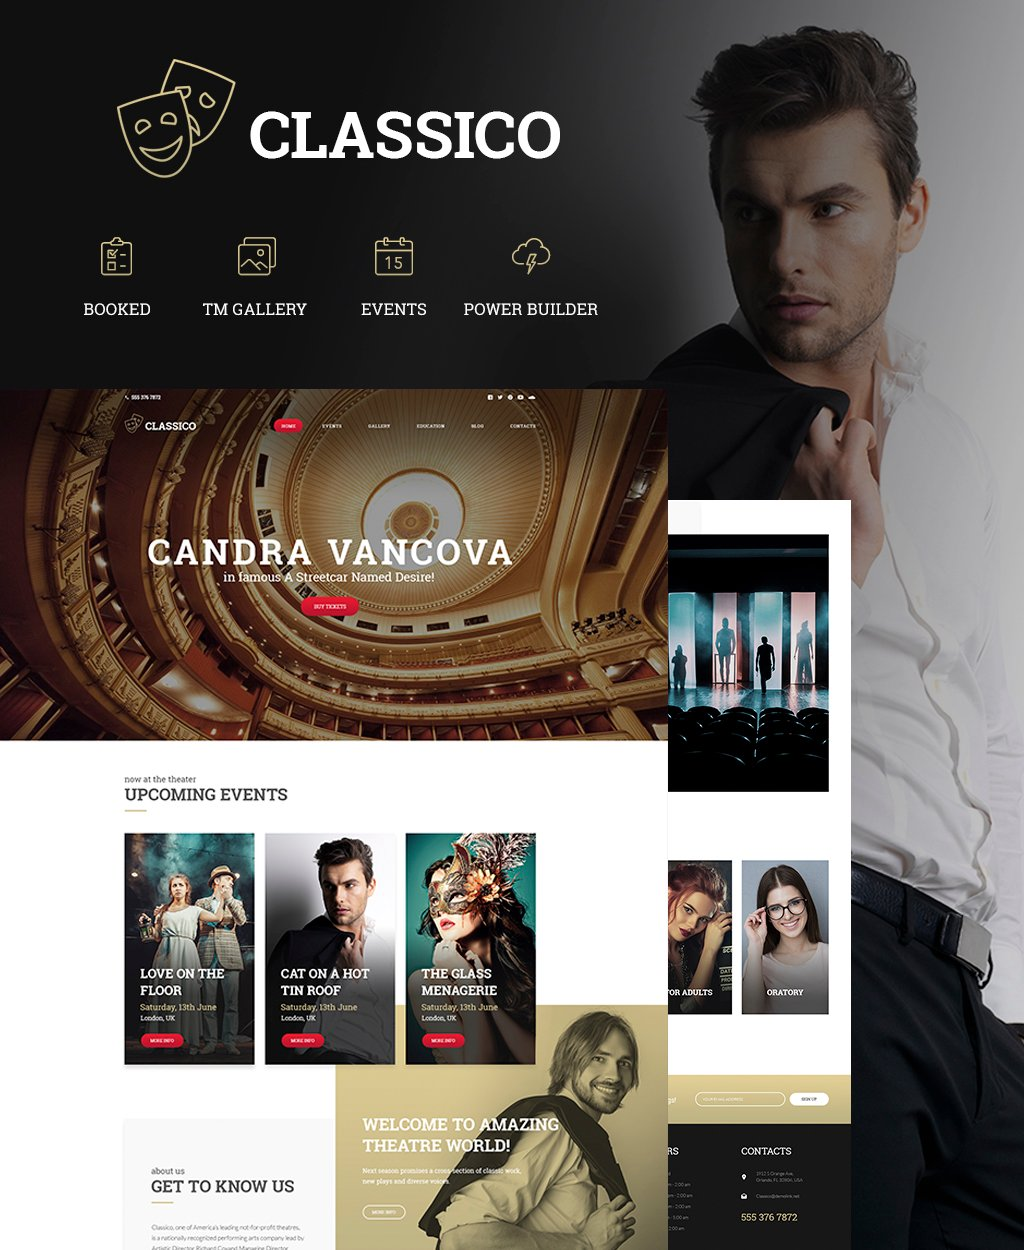 Classico - Theater Responsive WordPress Theme - screenshot